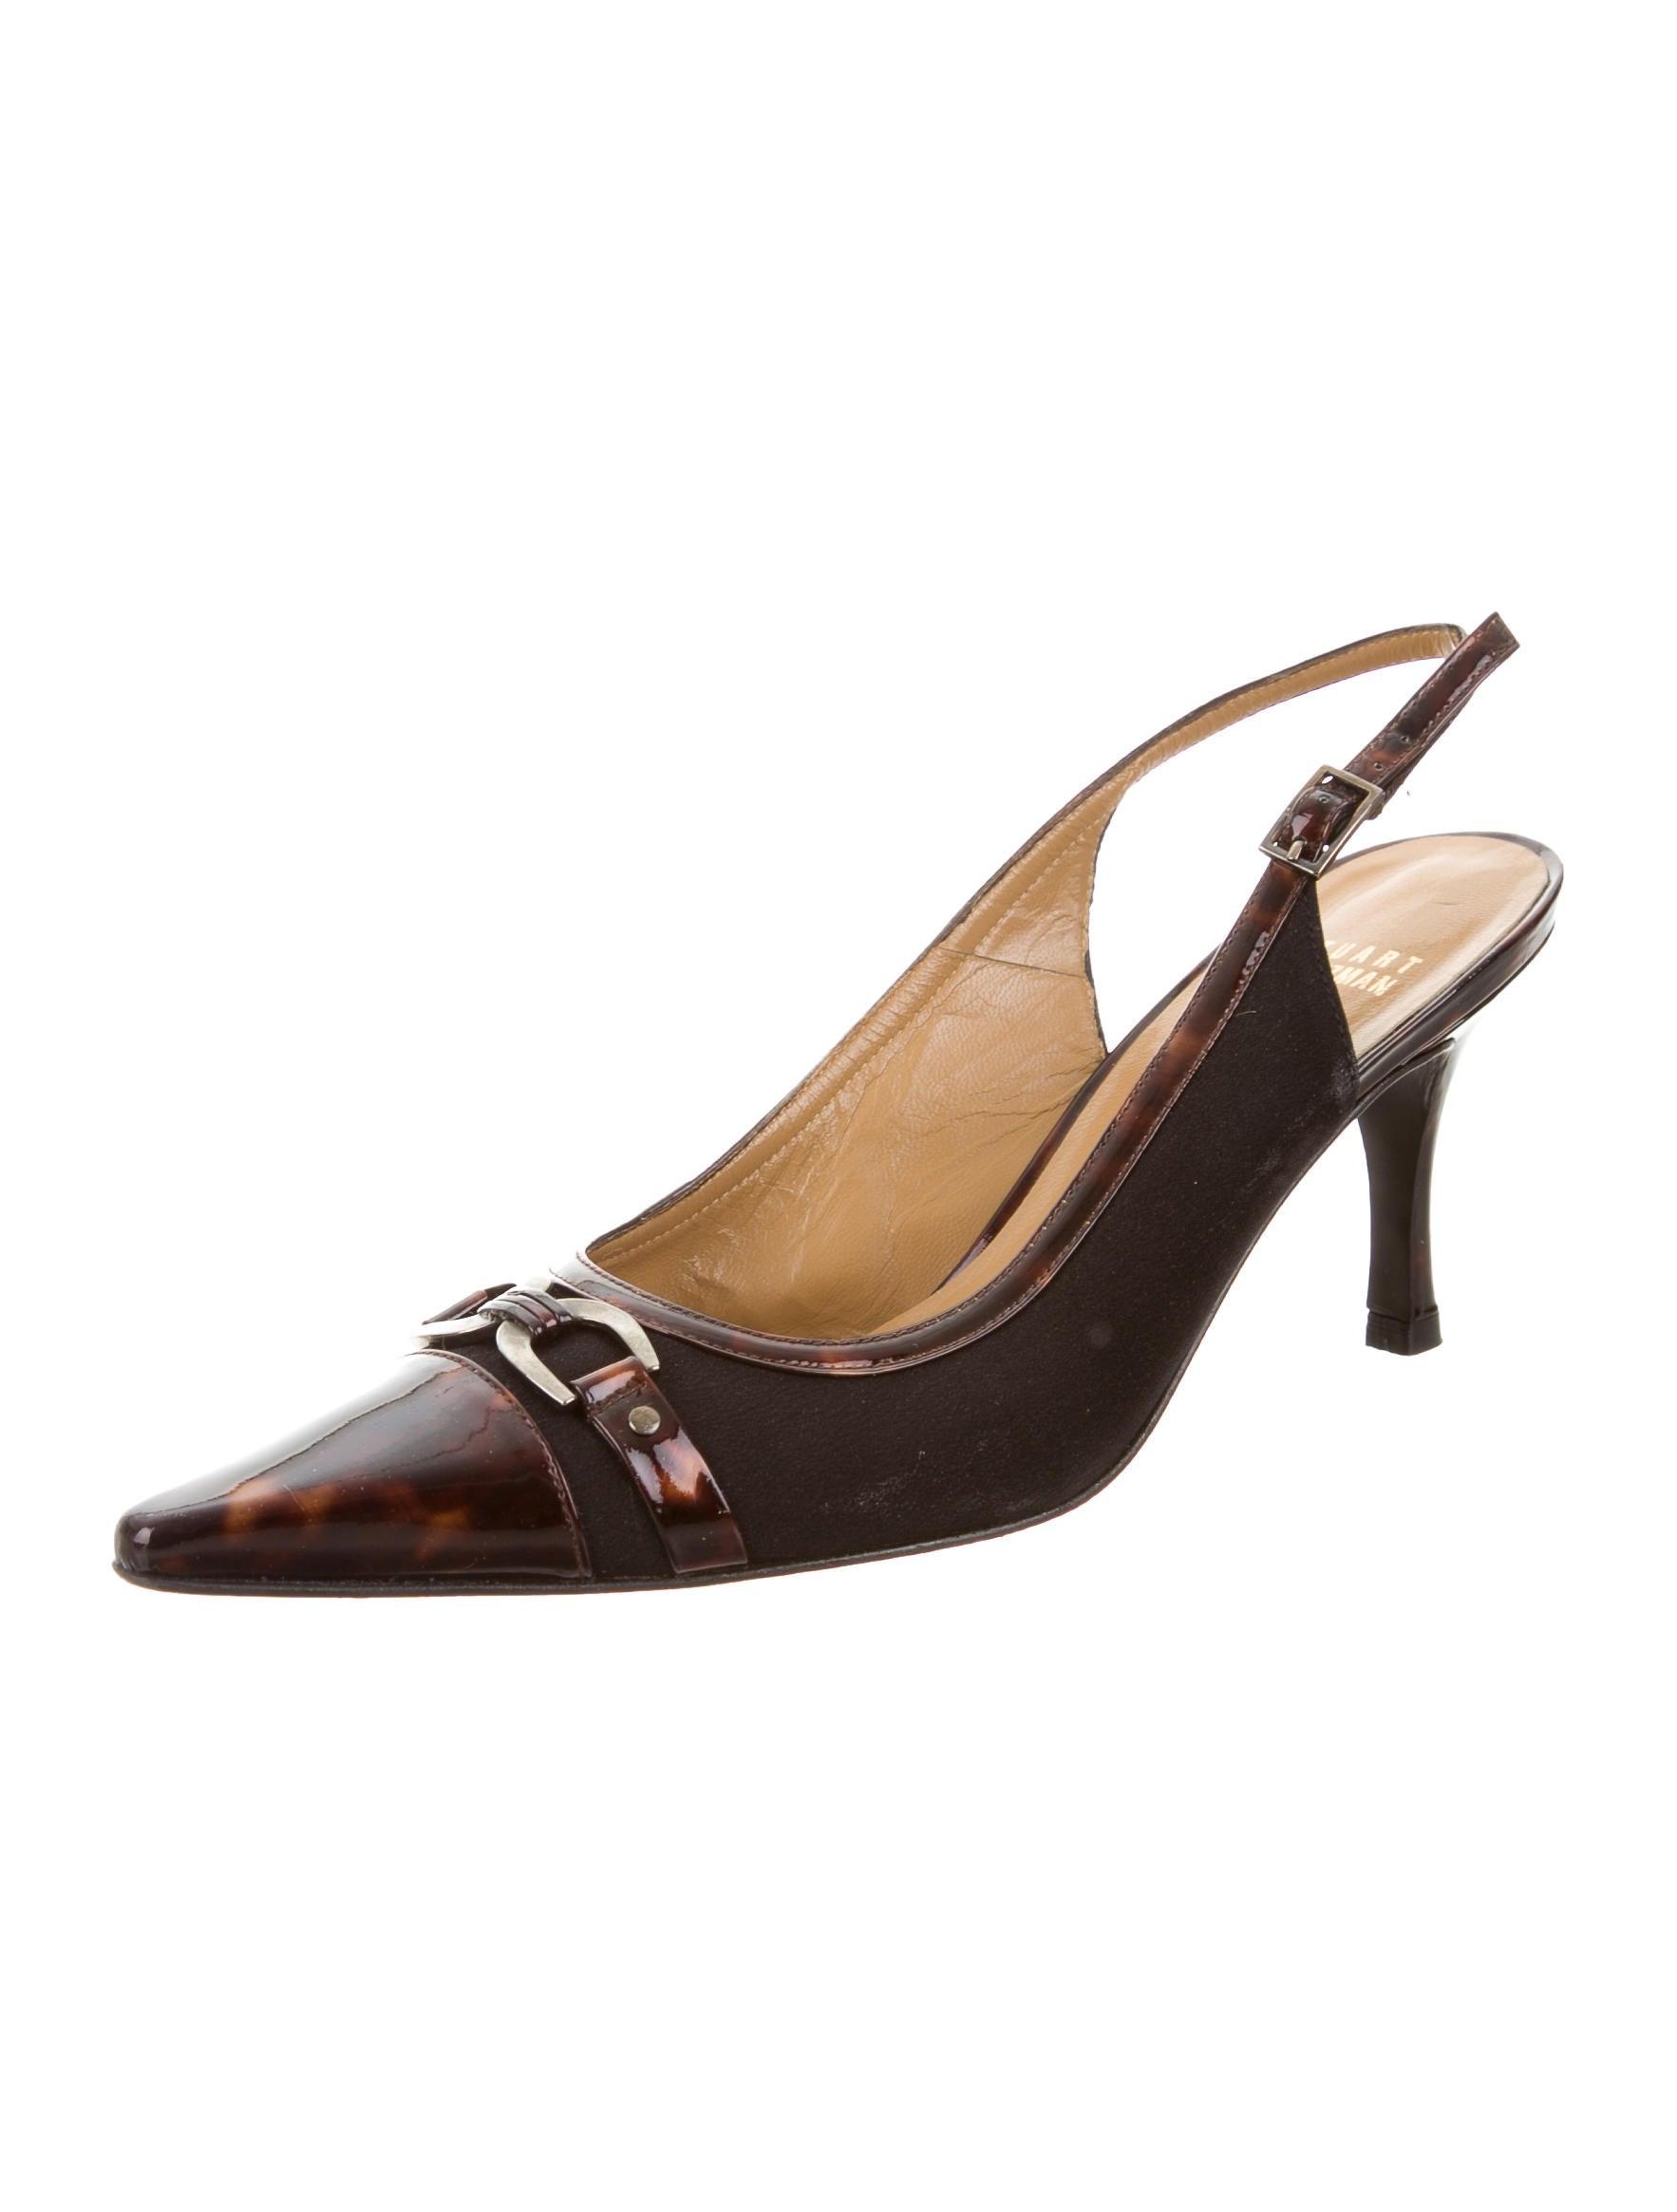 Stuart Weitzman Pointed-Toe Slingback Pumps - Shoes - WSU32480 | The RealReal